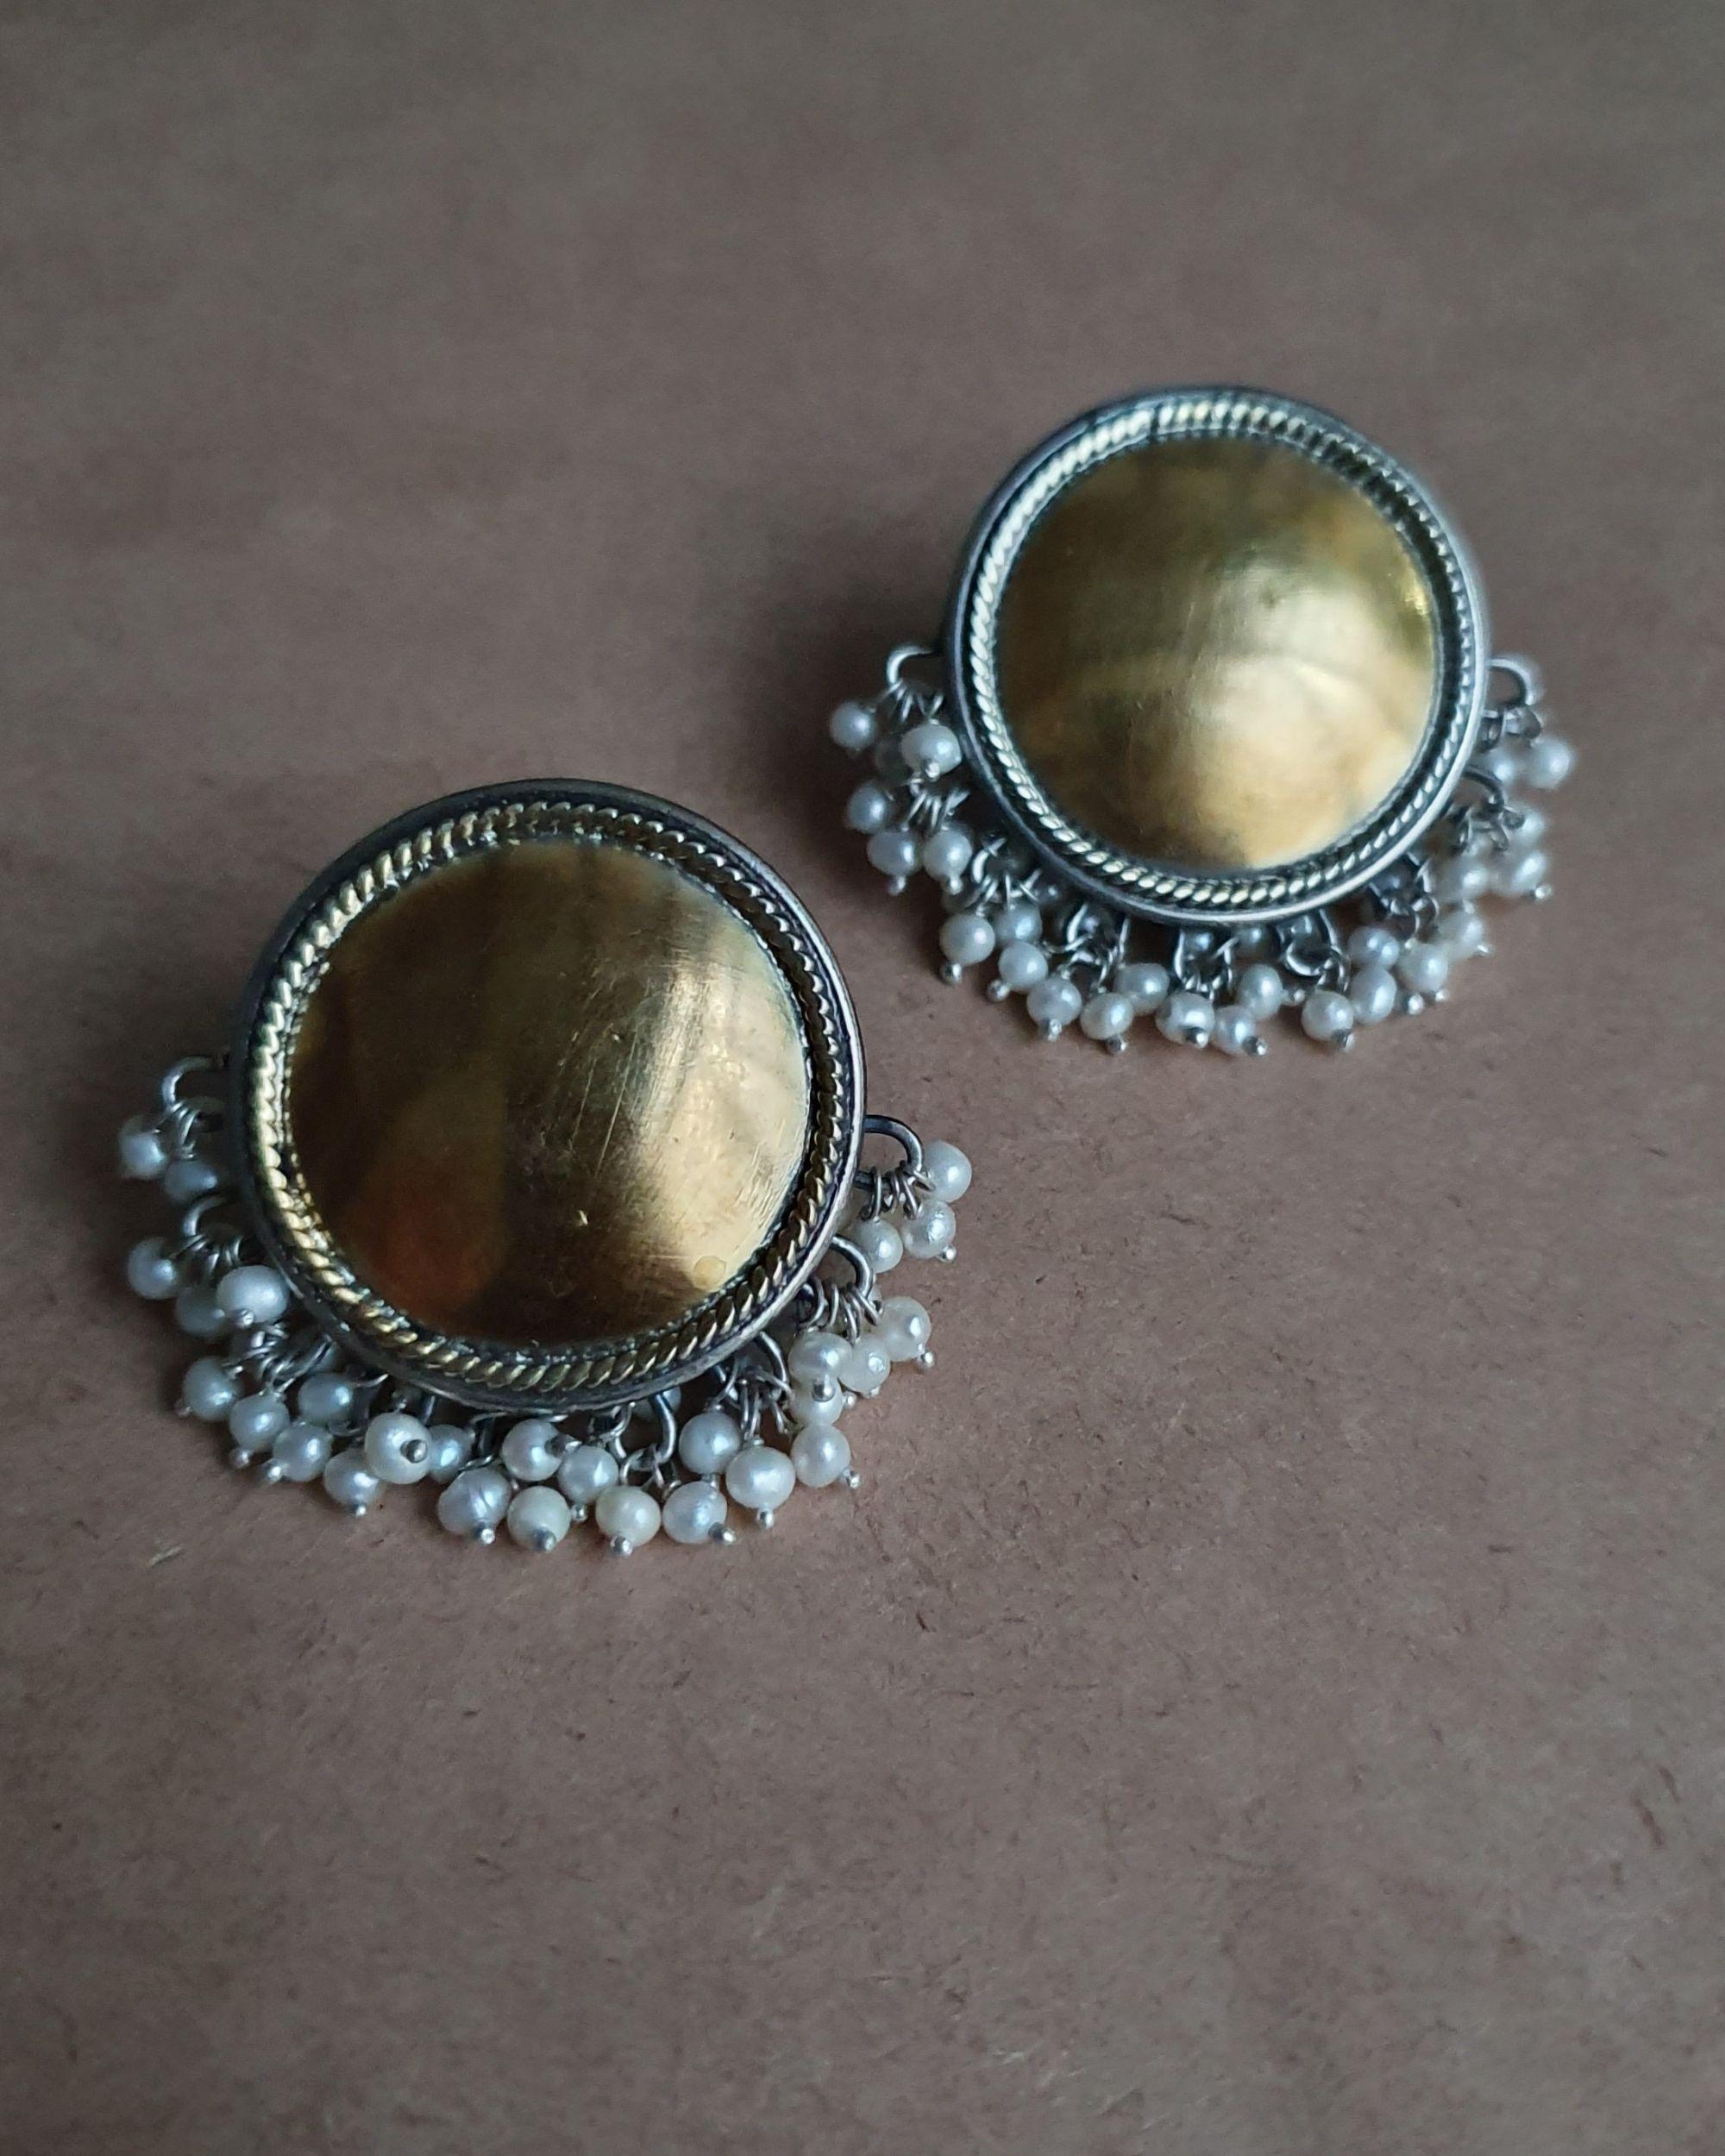 Full moon pearl earrings